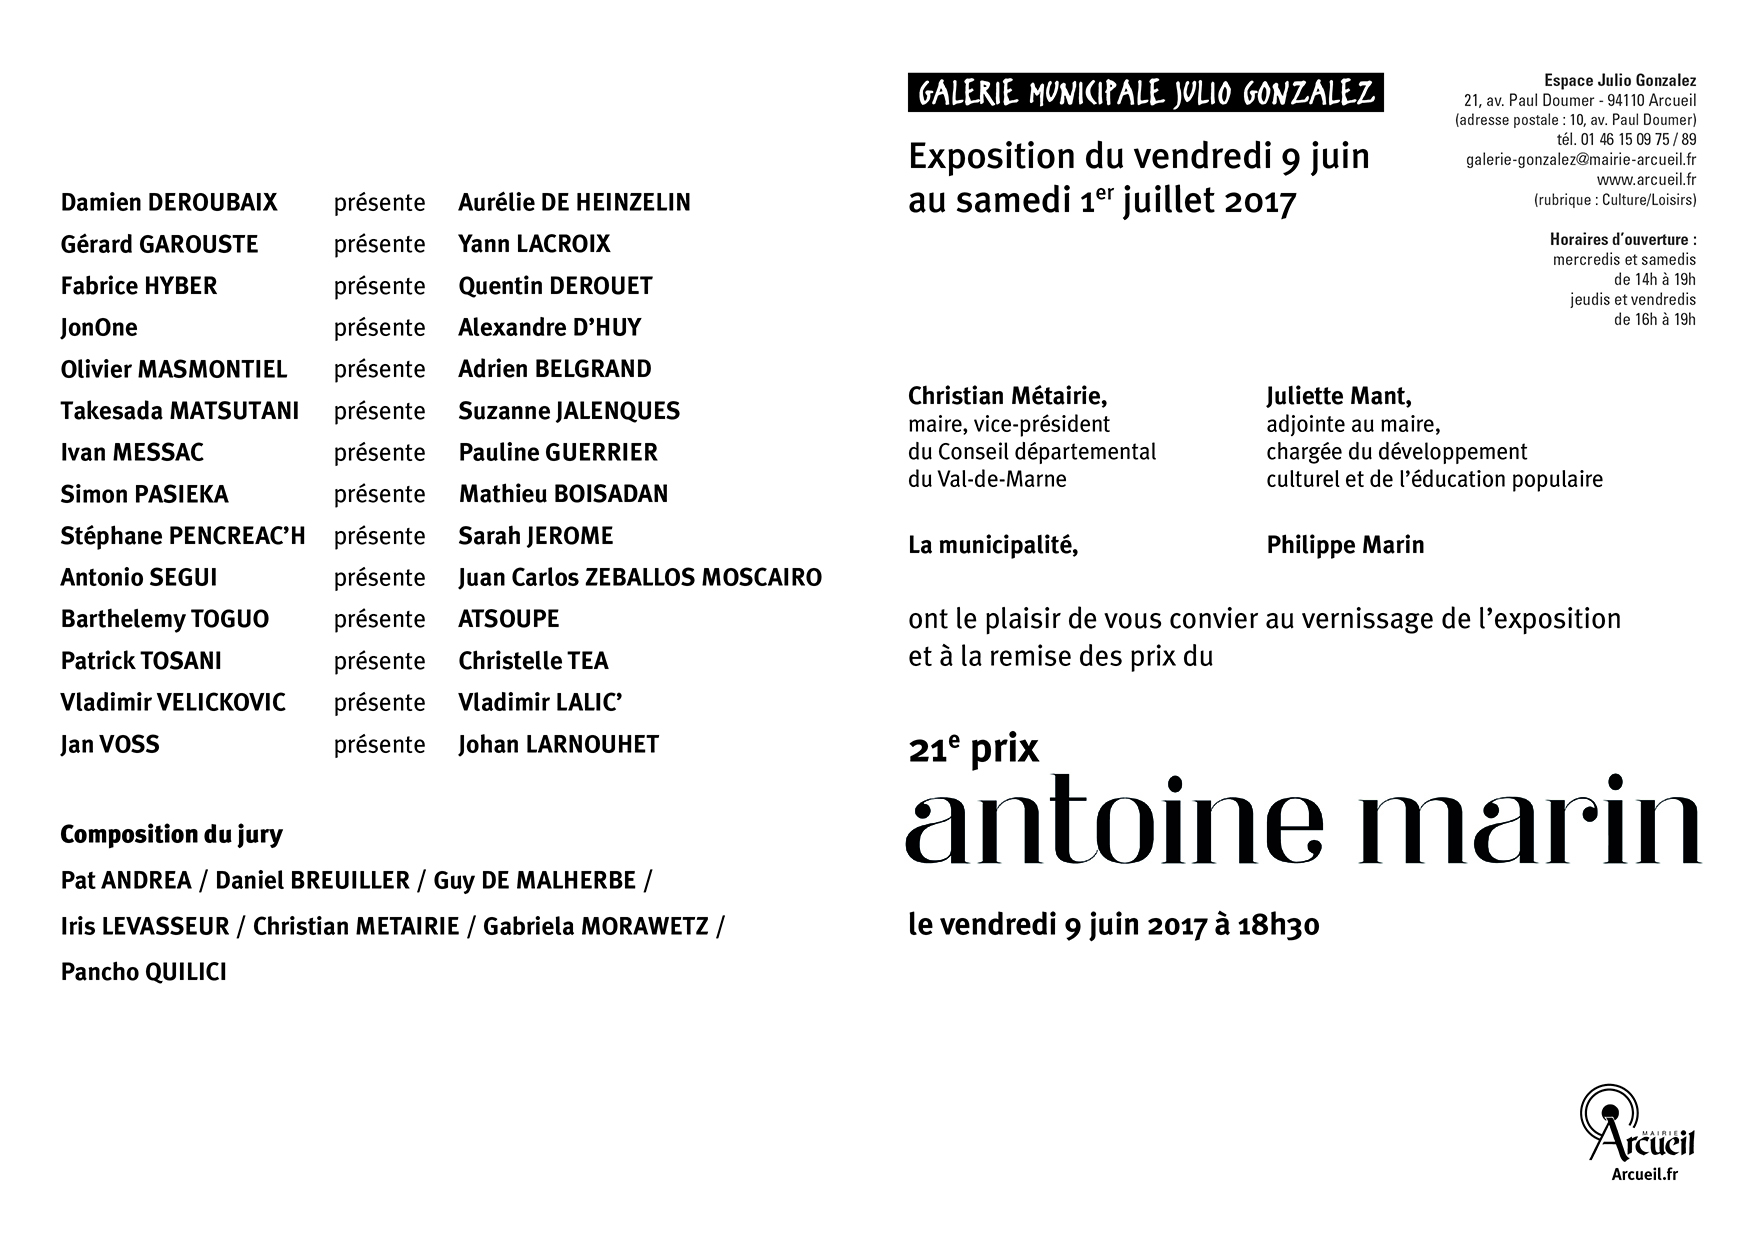 21ème prix ANTOINE MARIN